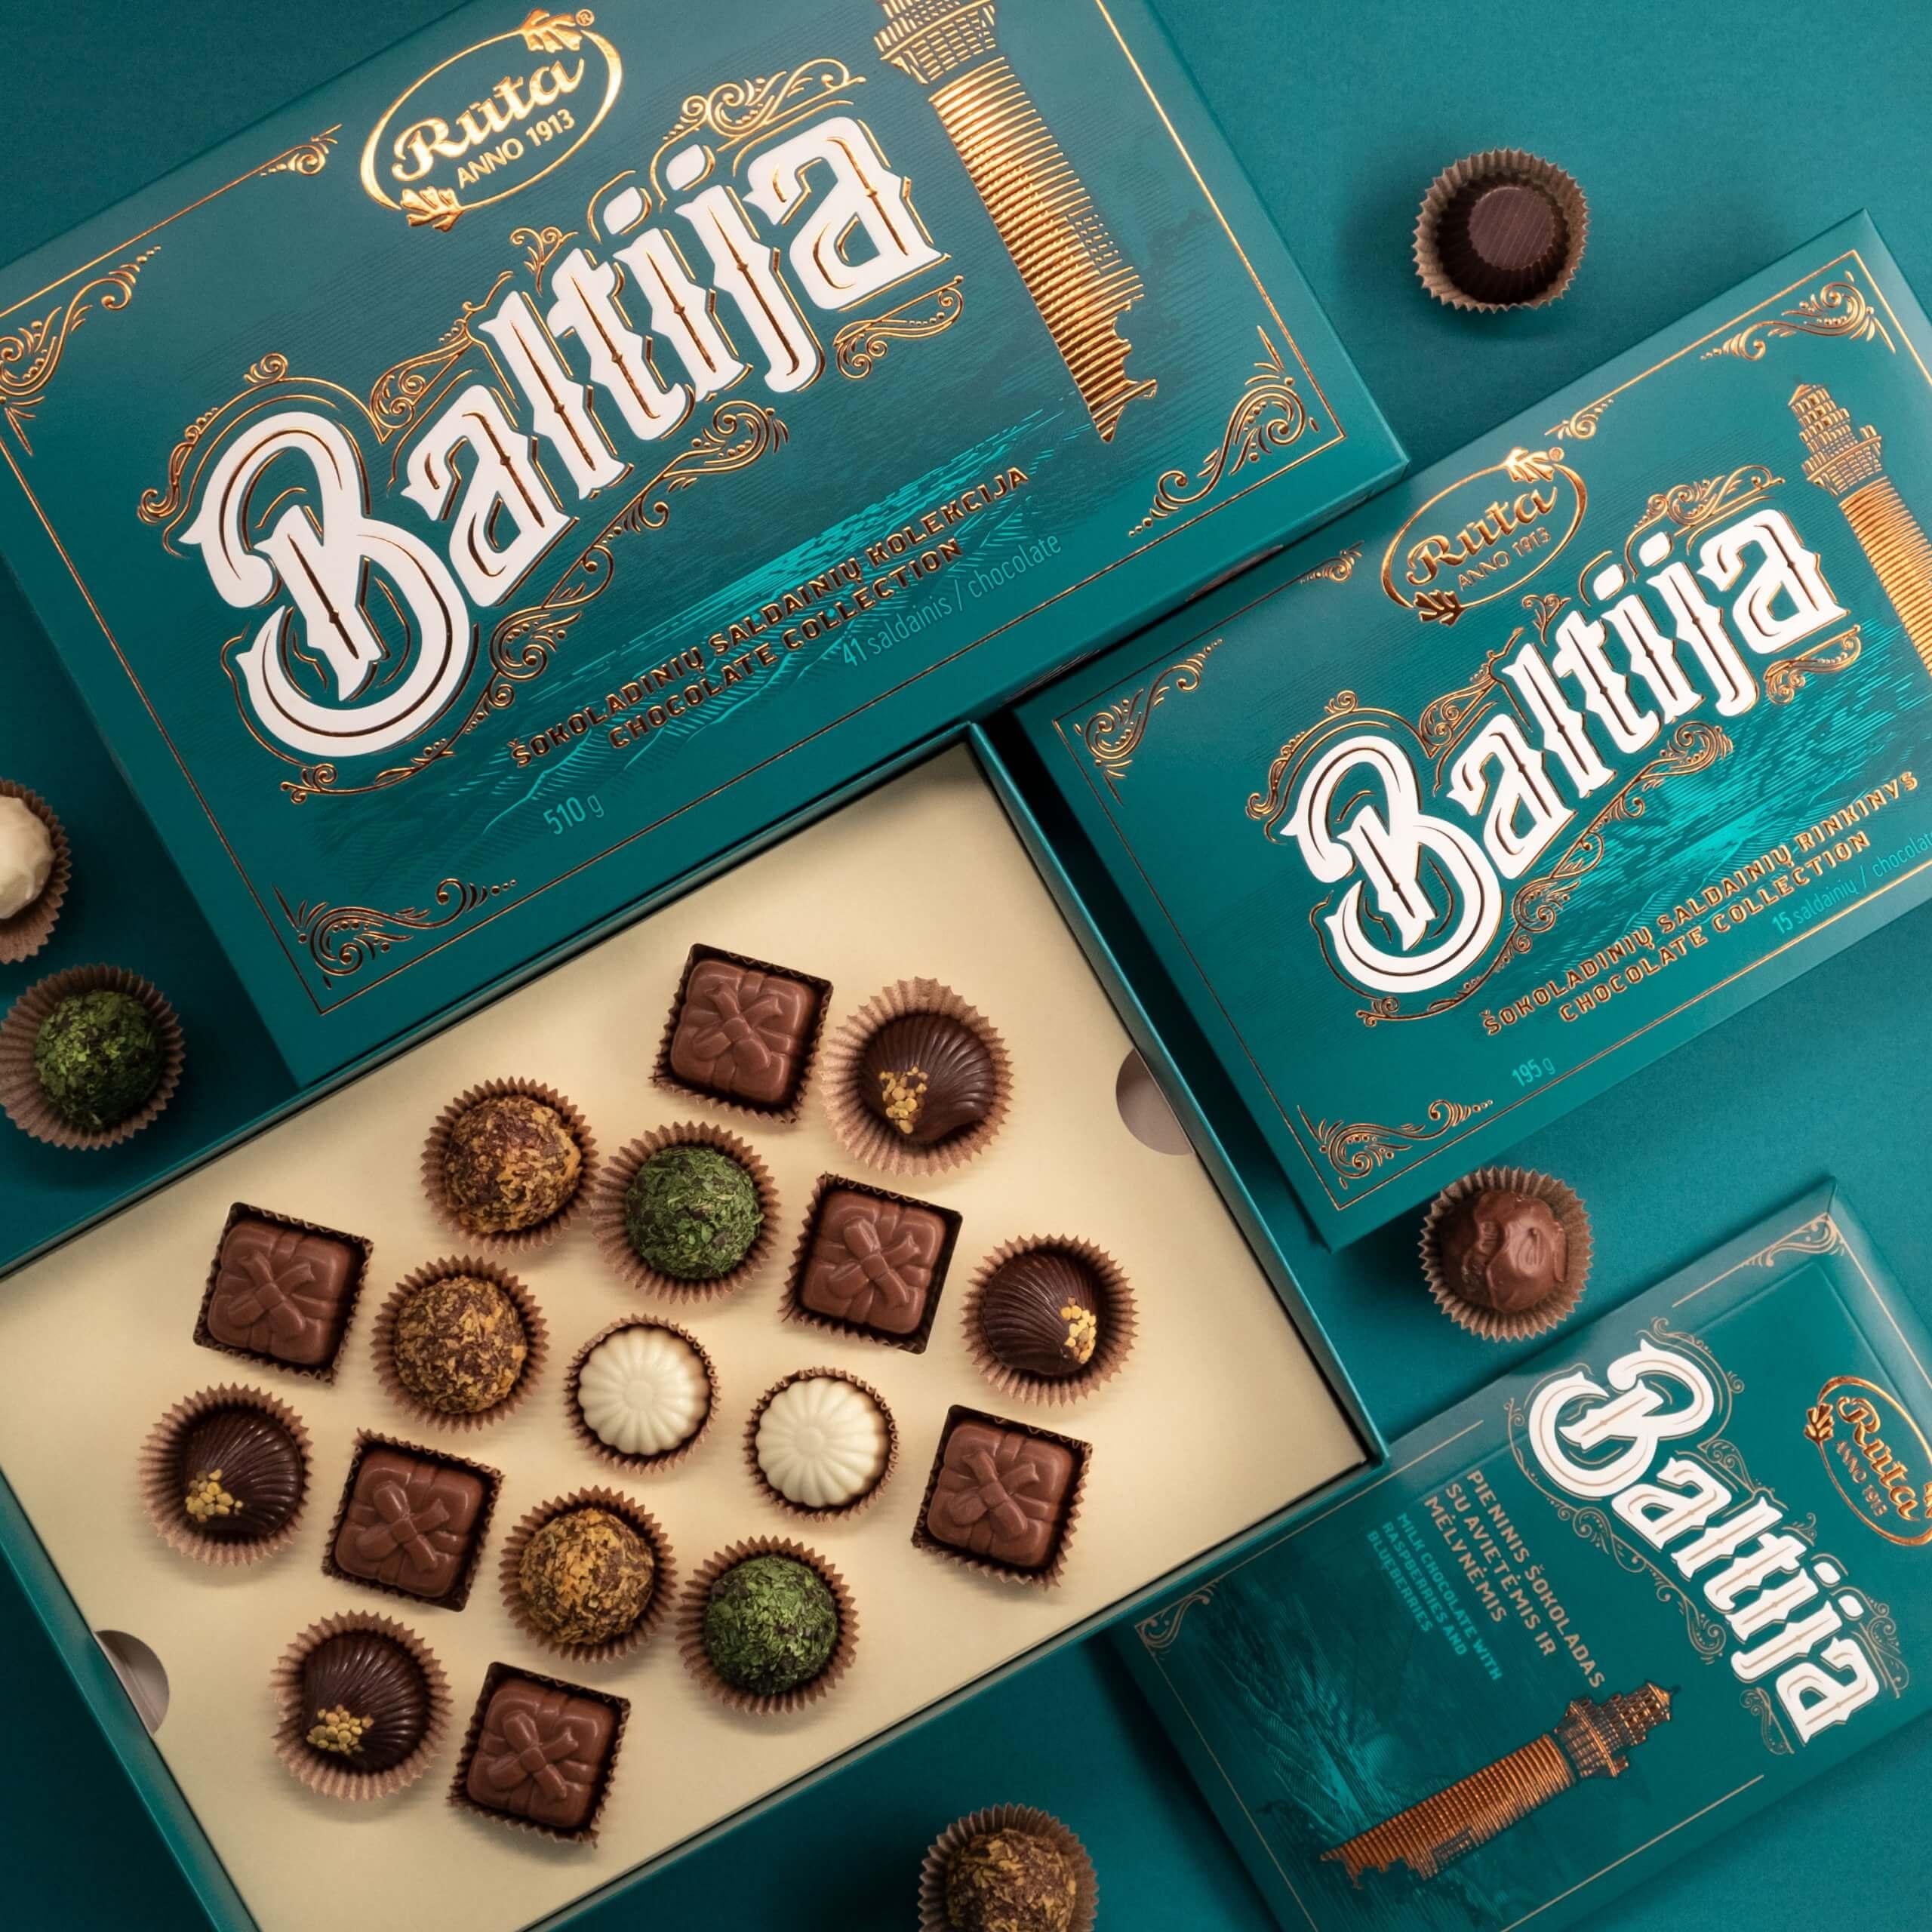 Baltija Chocolate Collection Packaging Design